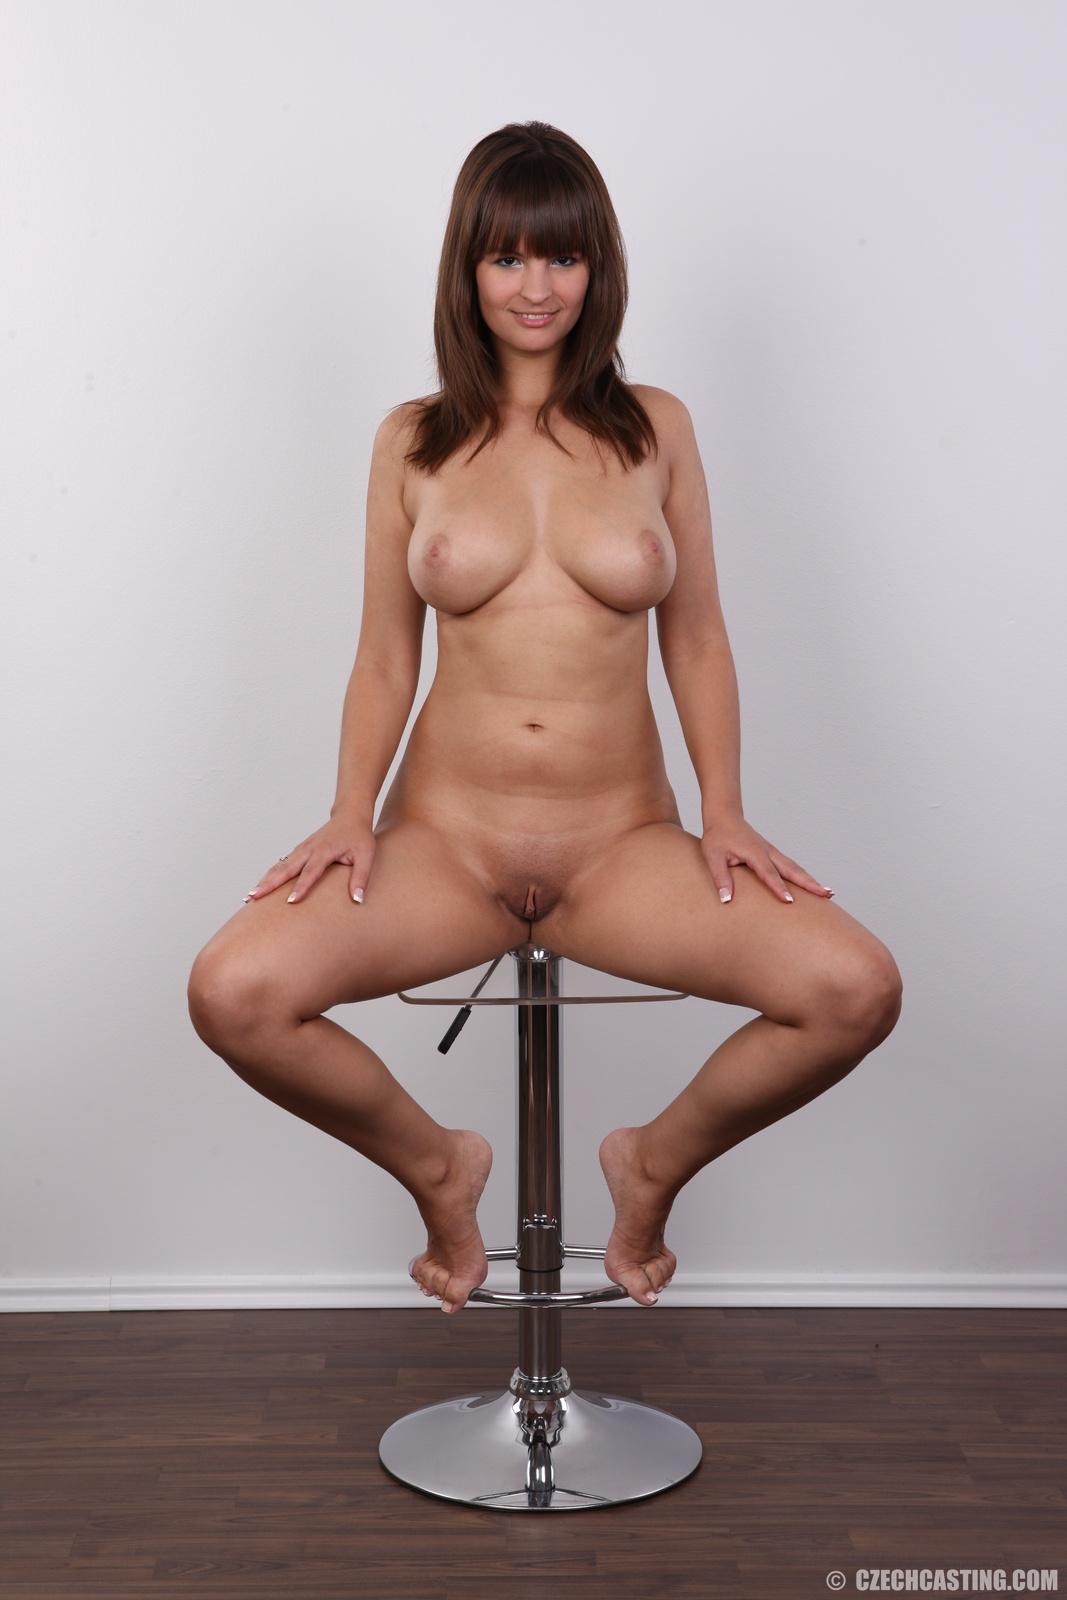 Amatuer wife porn videos